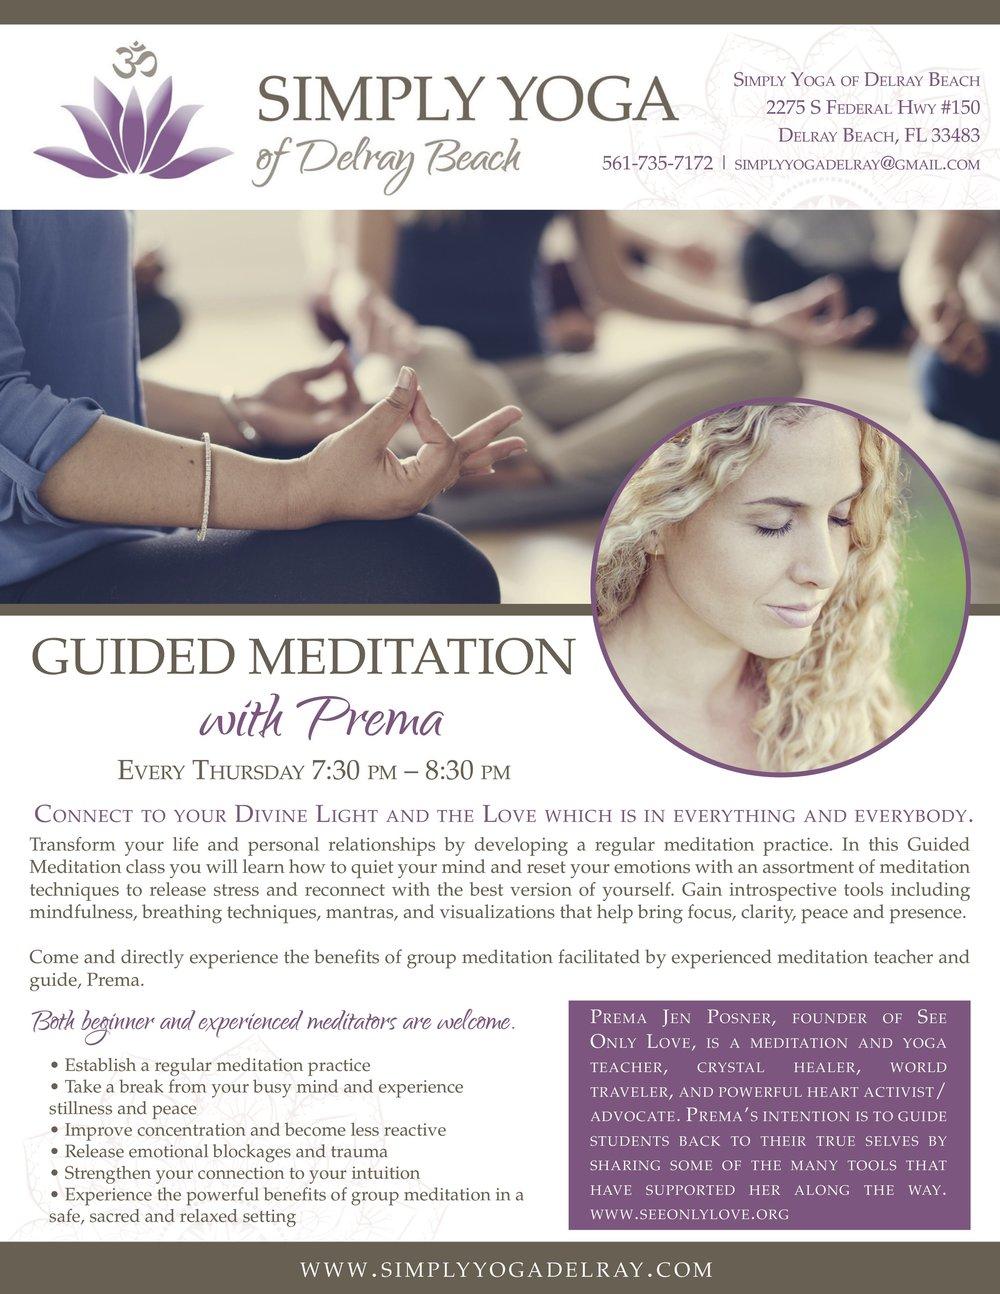 SYDRB Guided Meditation Flyer 8.5x11 FINAL no crops.jpg